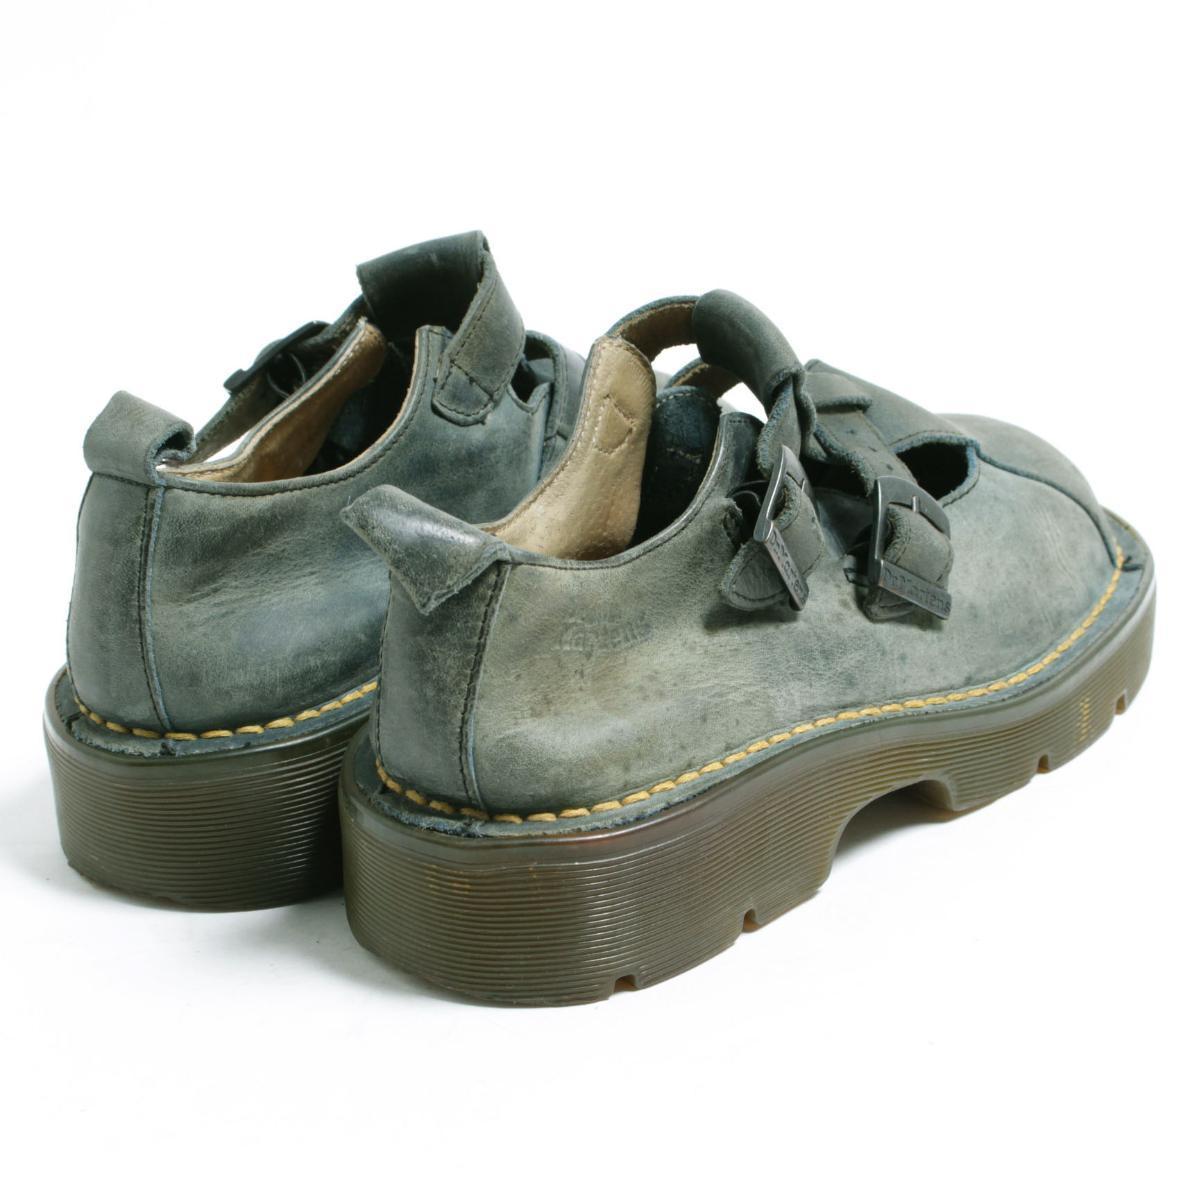 UK5 Lady's 23.5cm /bom6715 made in the doctor Martin Dr.Martens strap shoes U.K.